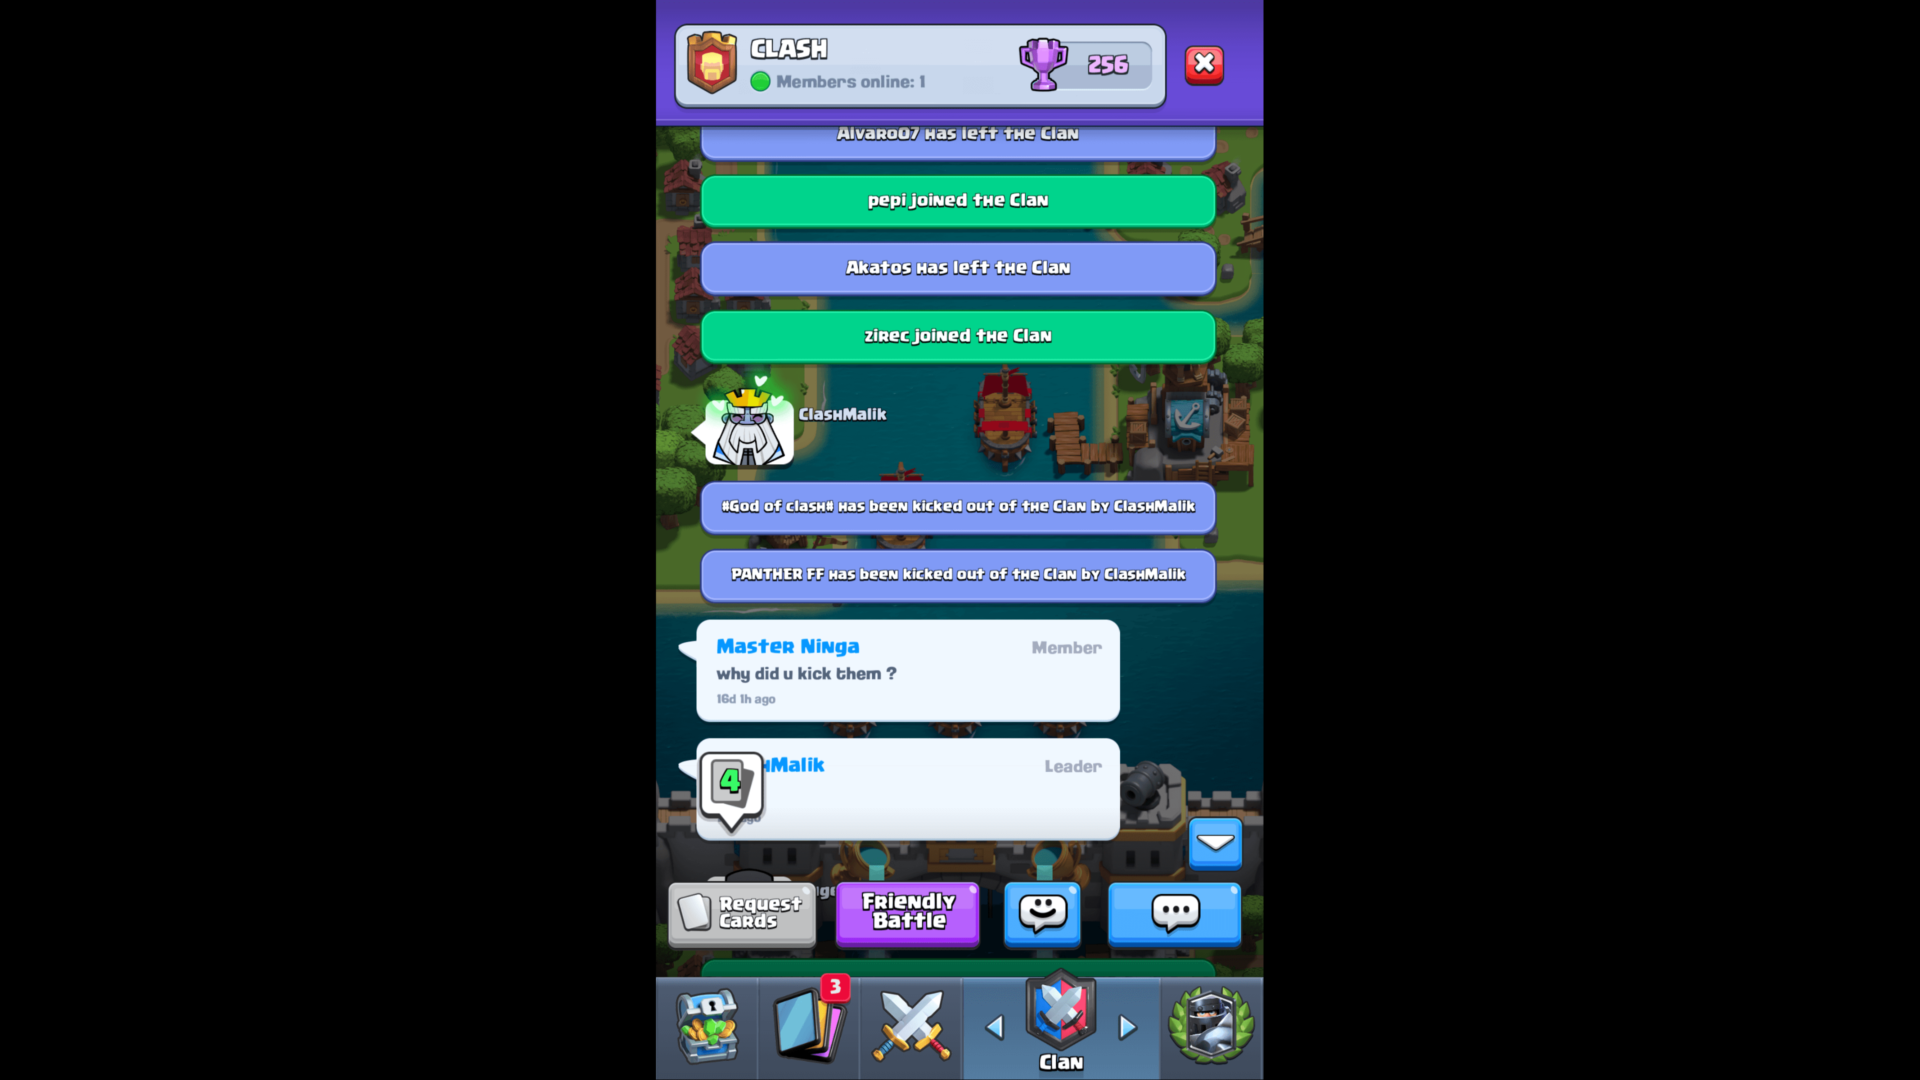 Clan dialogue screenshot of Clash Royale video game interface.